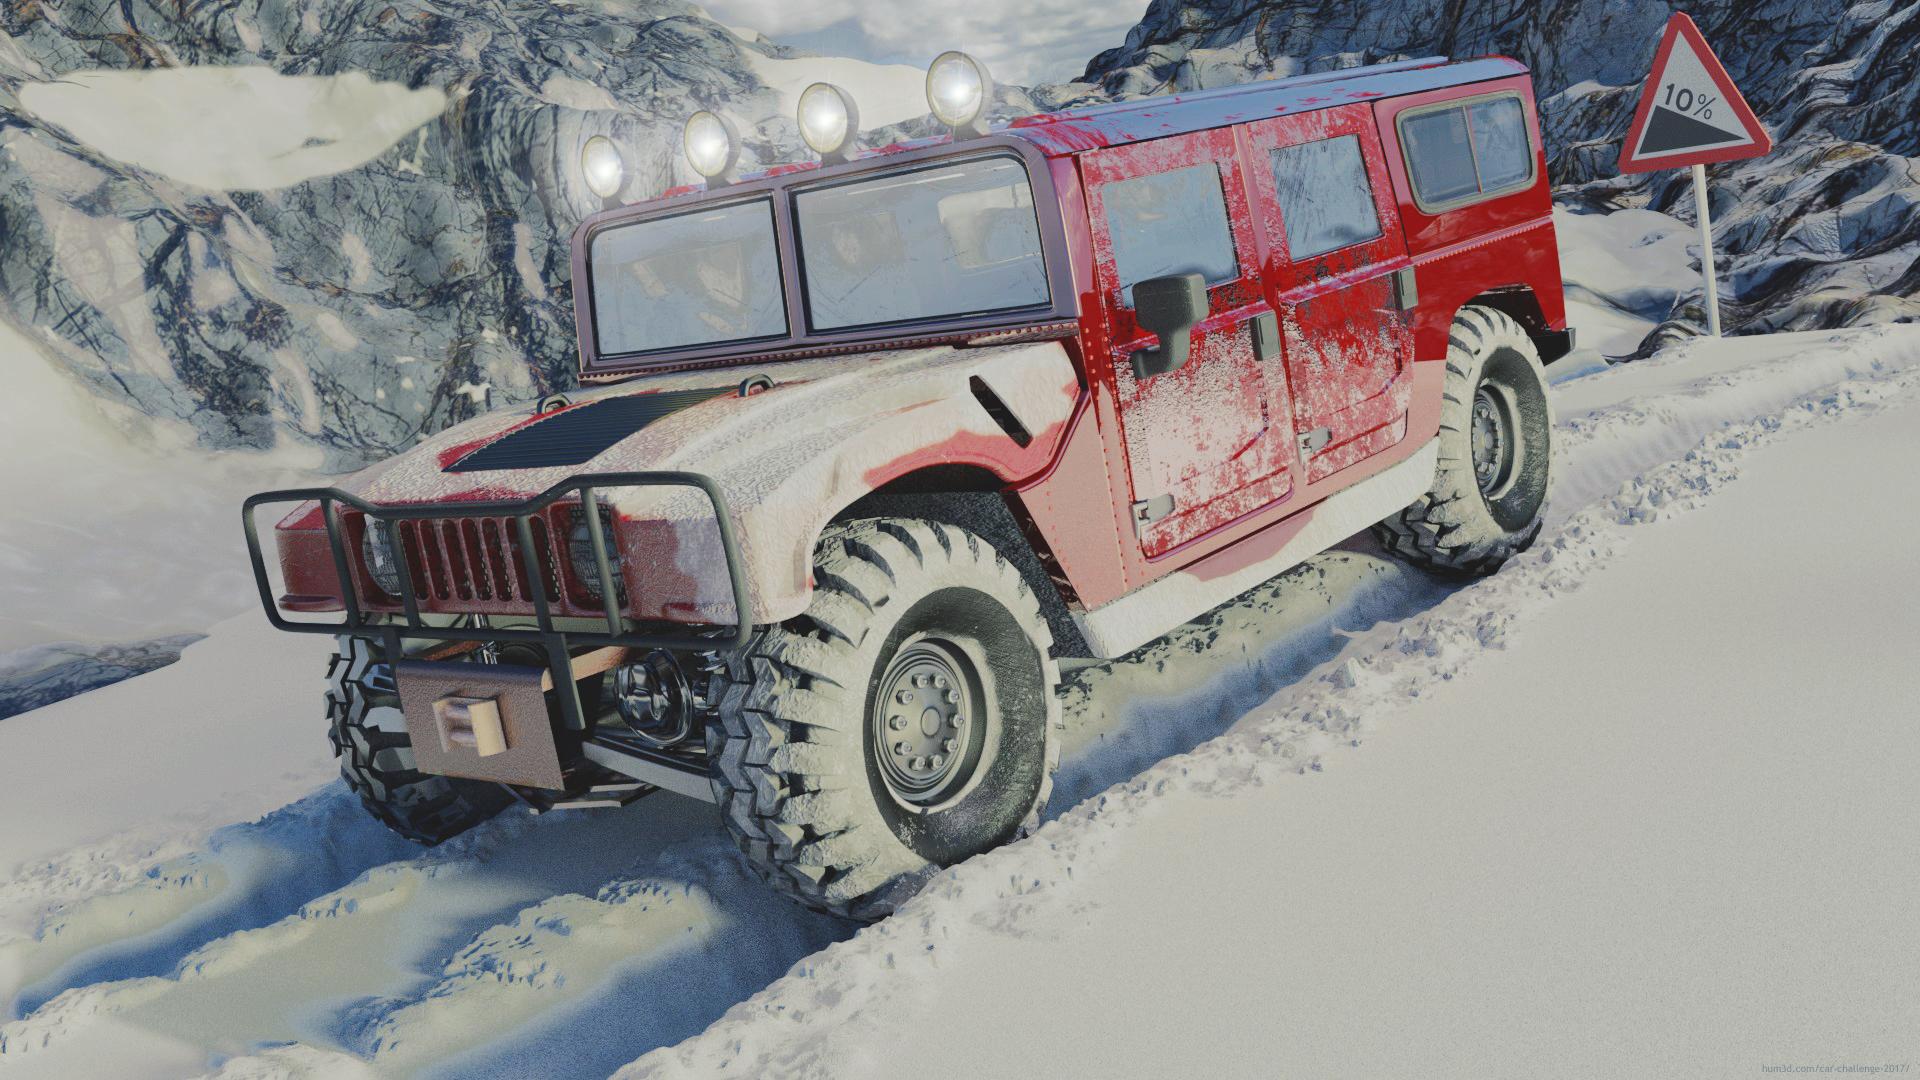 Snow and risky fun